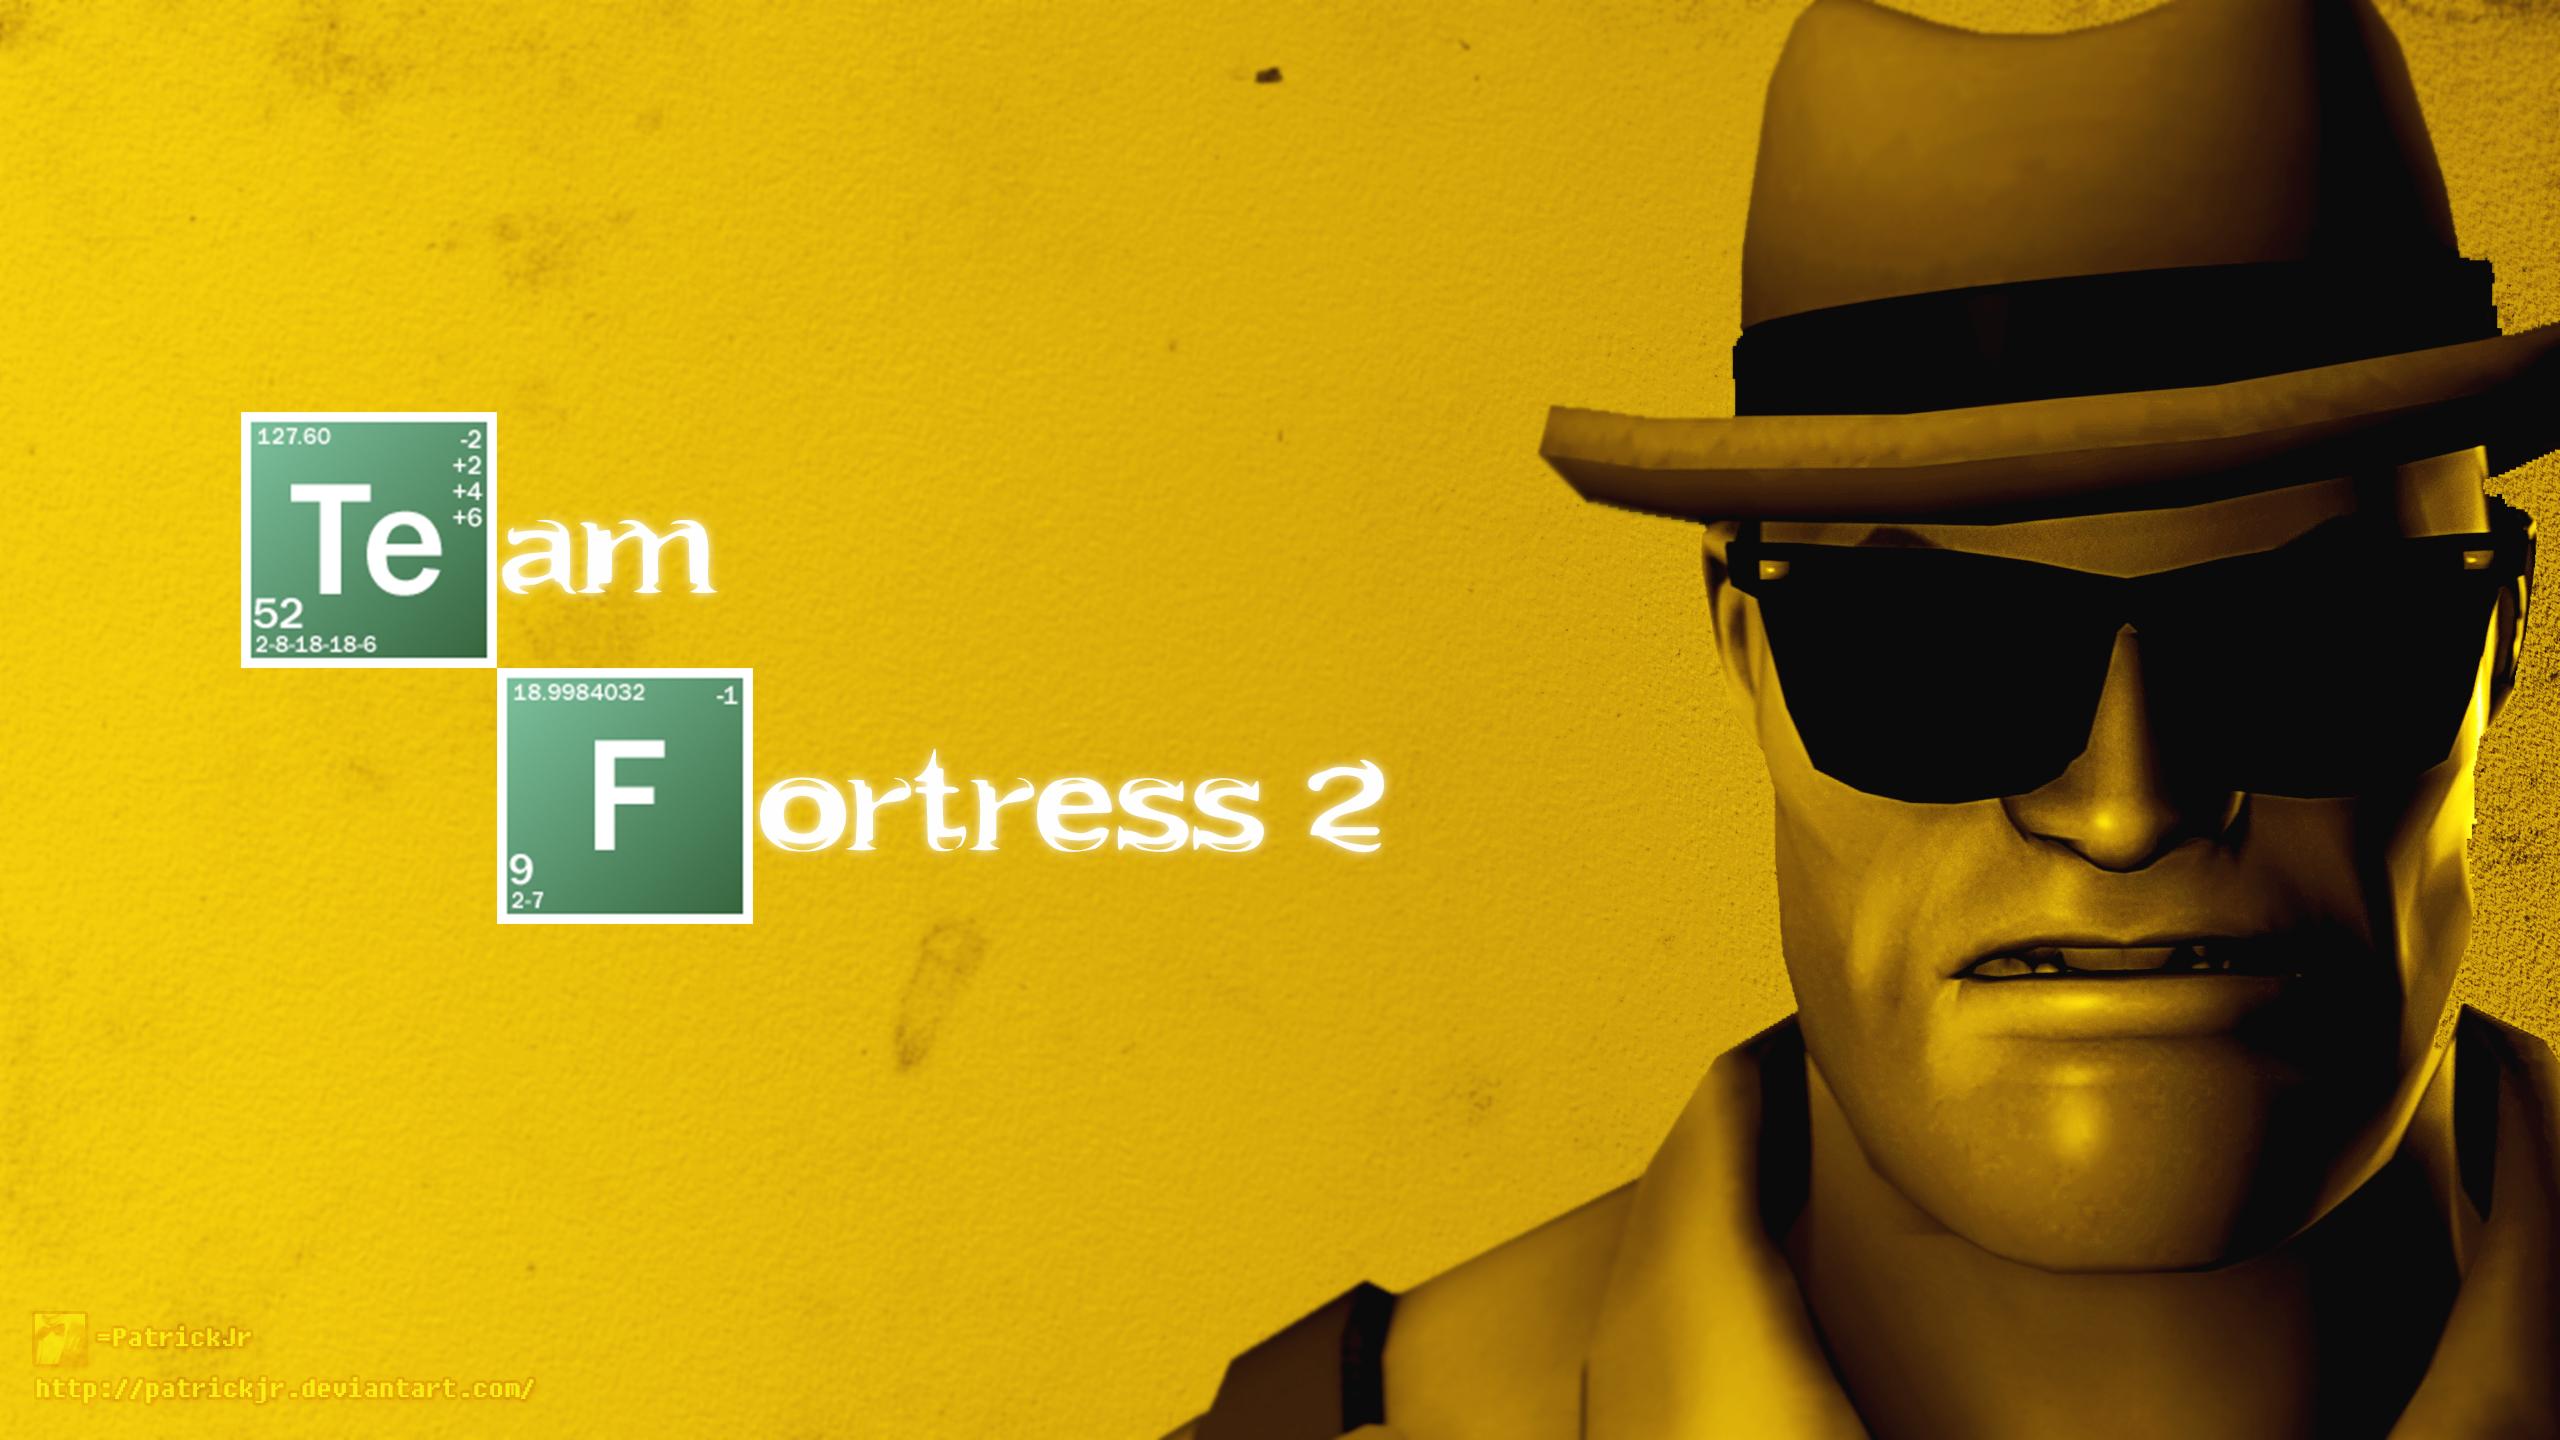 SFM Poster: Breaking Bad by PatrickJr